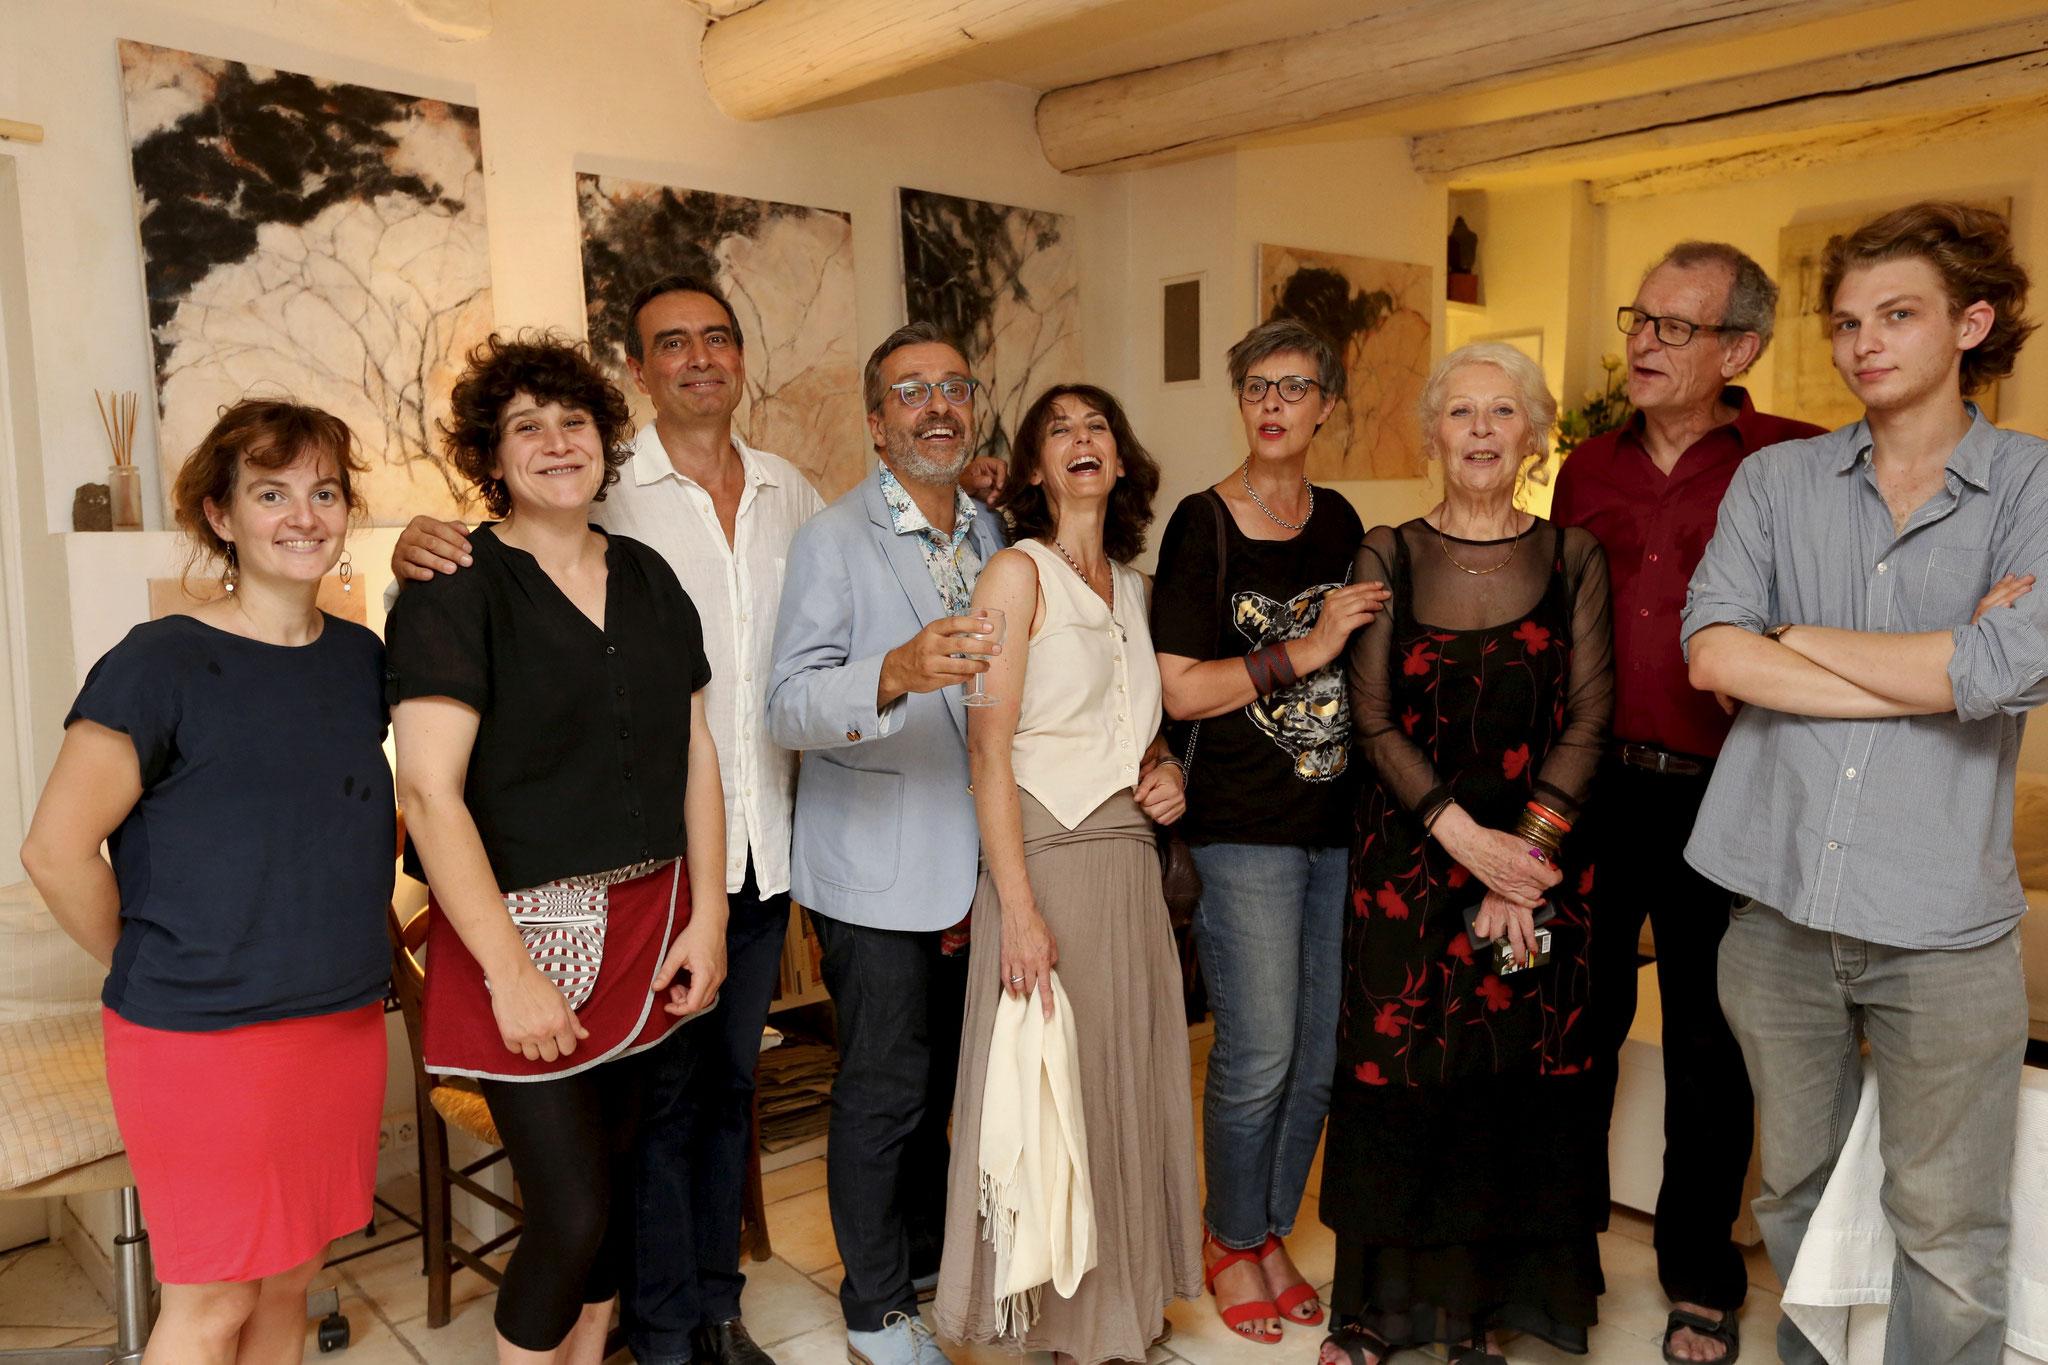 2017 - Marion Cousineau, Stéphane Pellet, Frederic Tort, Natacha Liège, Nathalie Campredon, Paule Tavera, Robert Guillot, Paul Berardi - ©Jérôme Rey